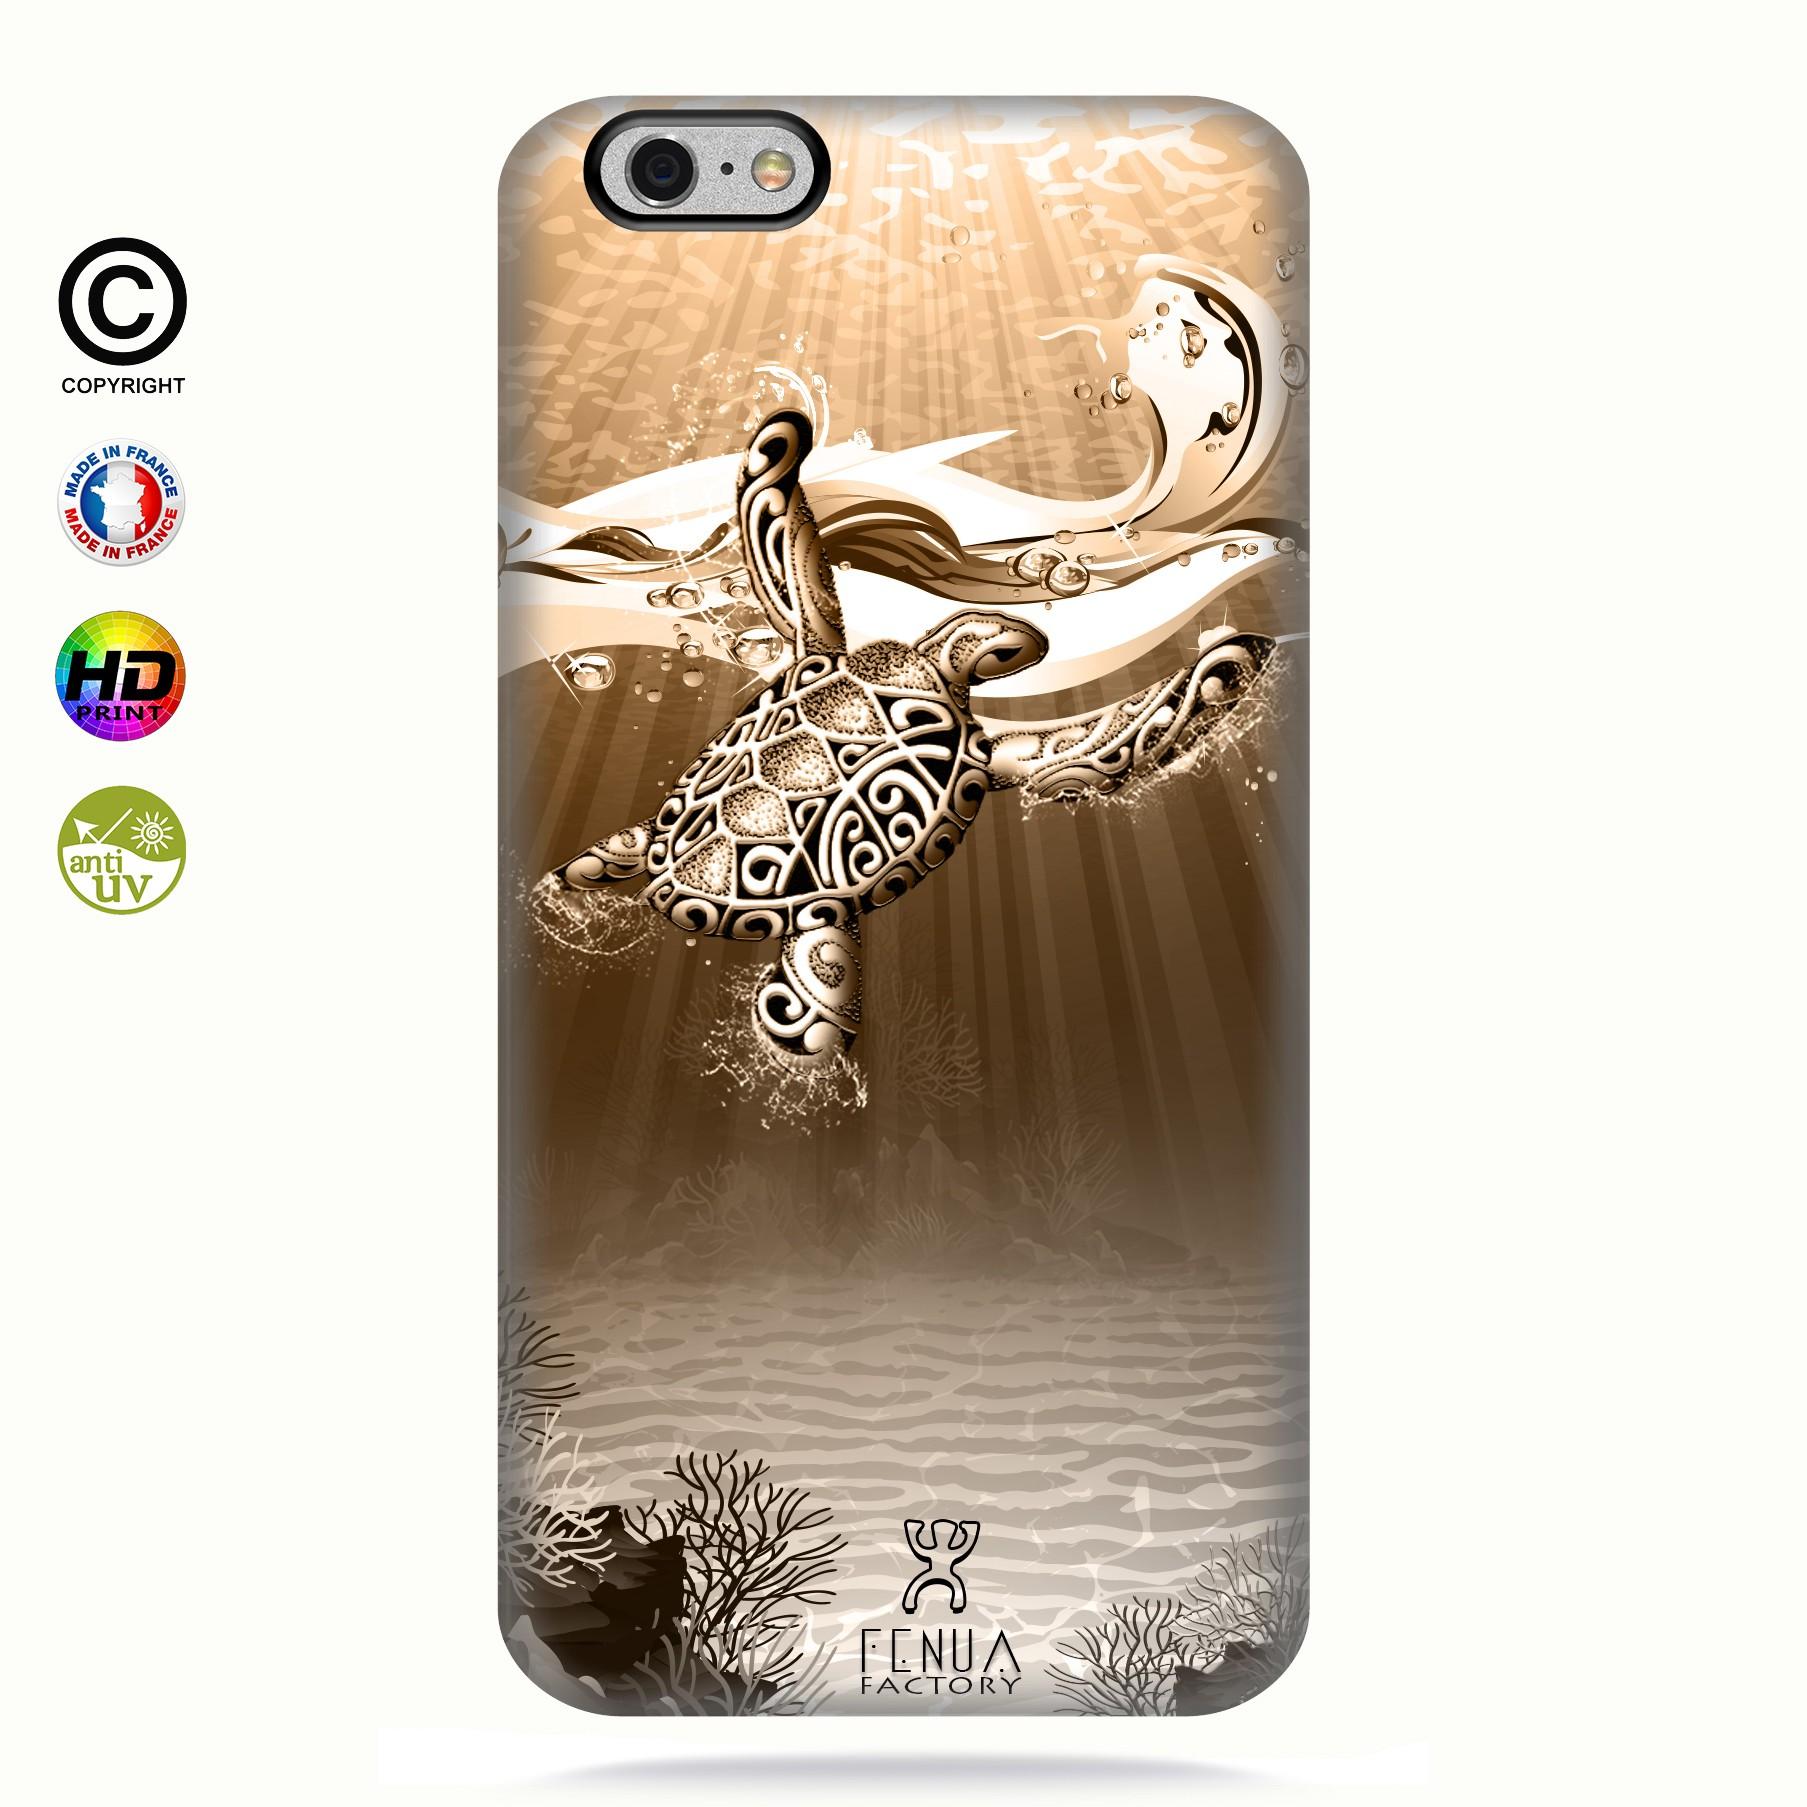 coque iphone 6 octopus